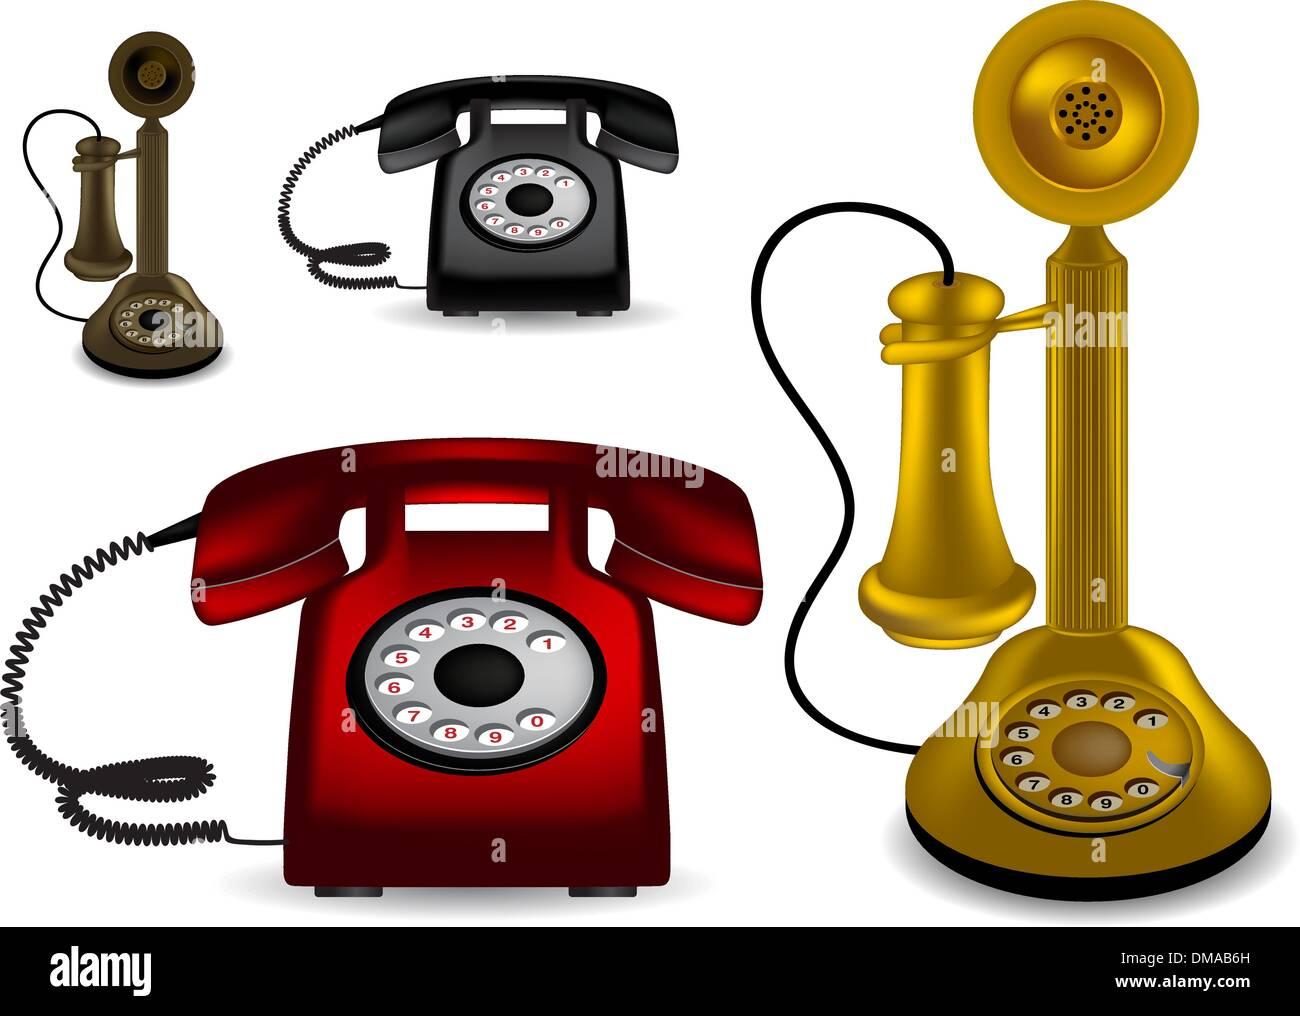 Retro telephone - vector illustration - Stock Image